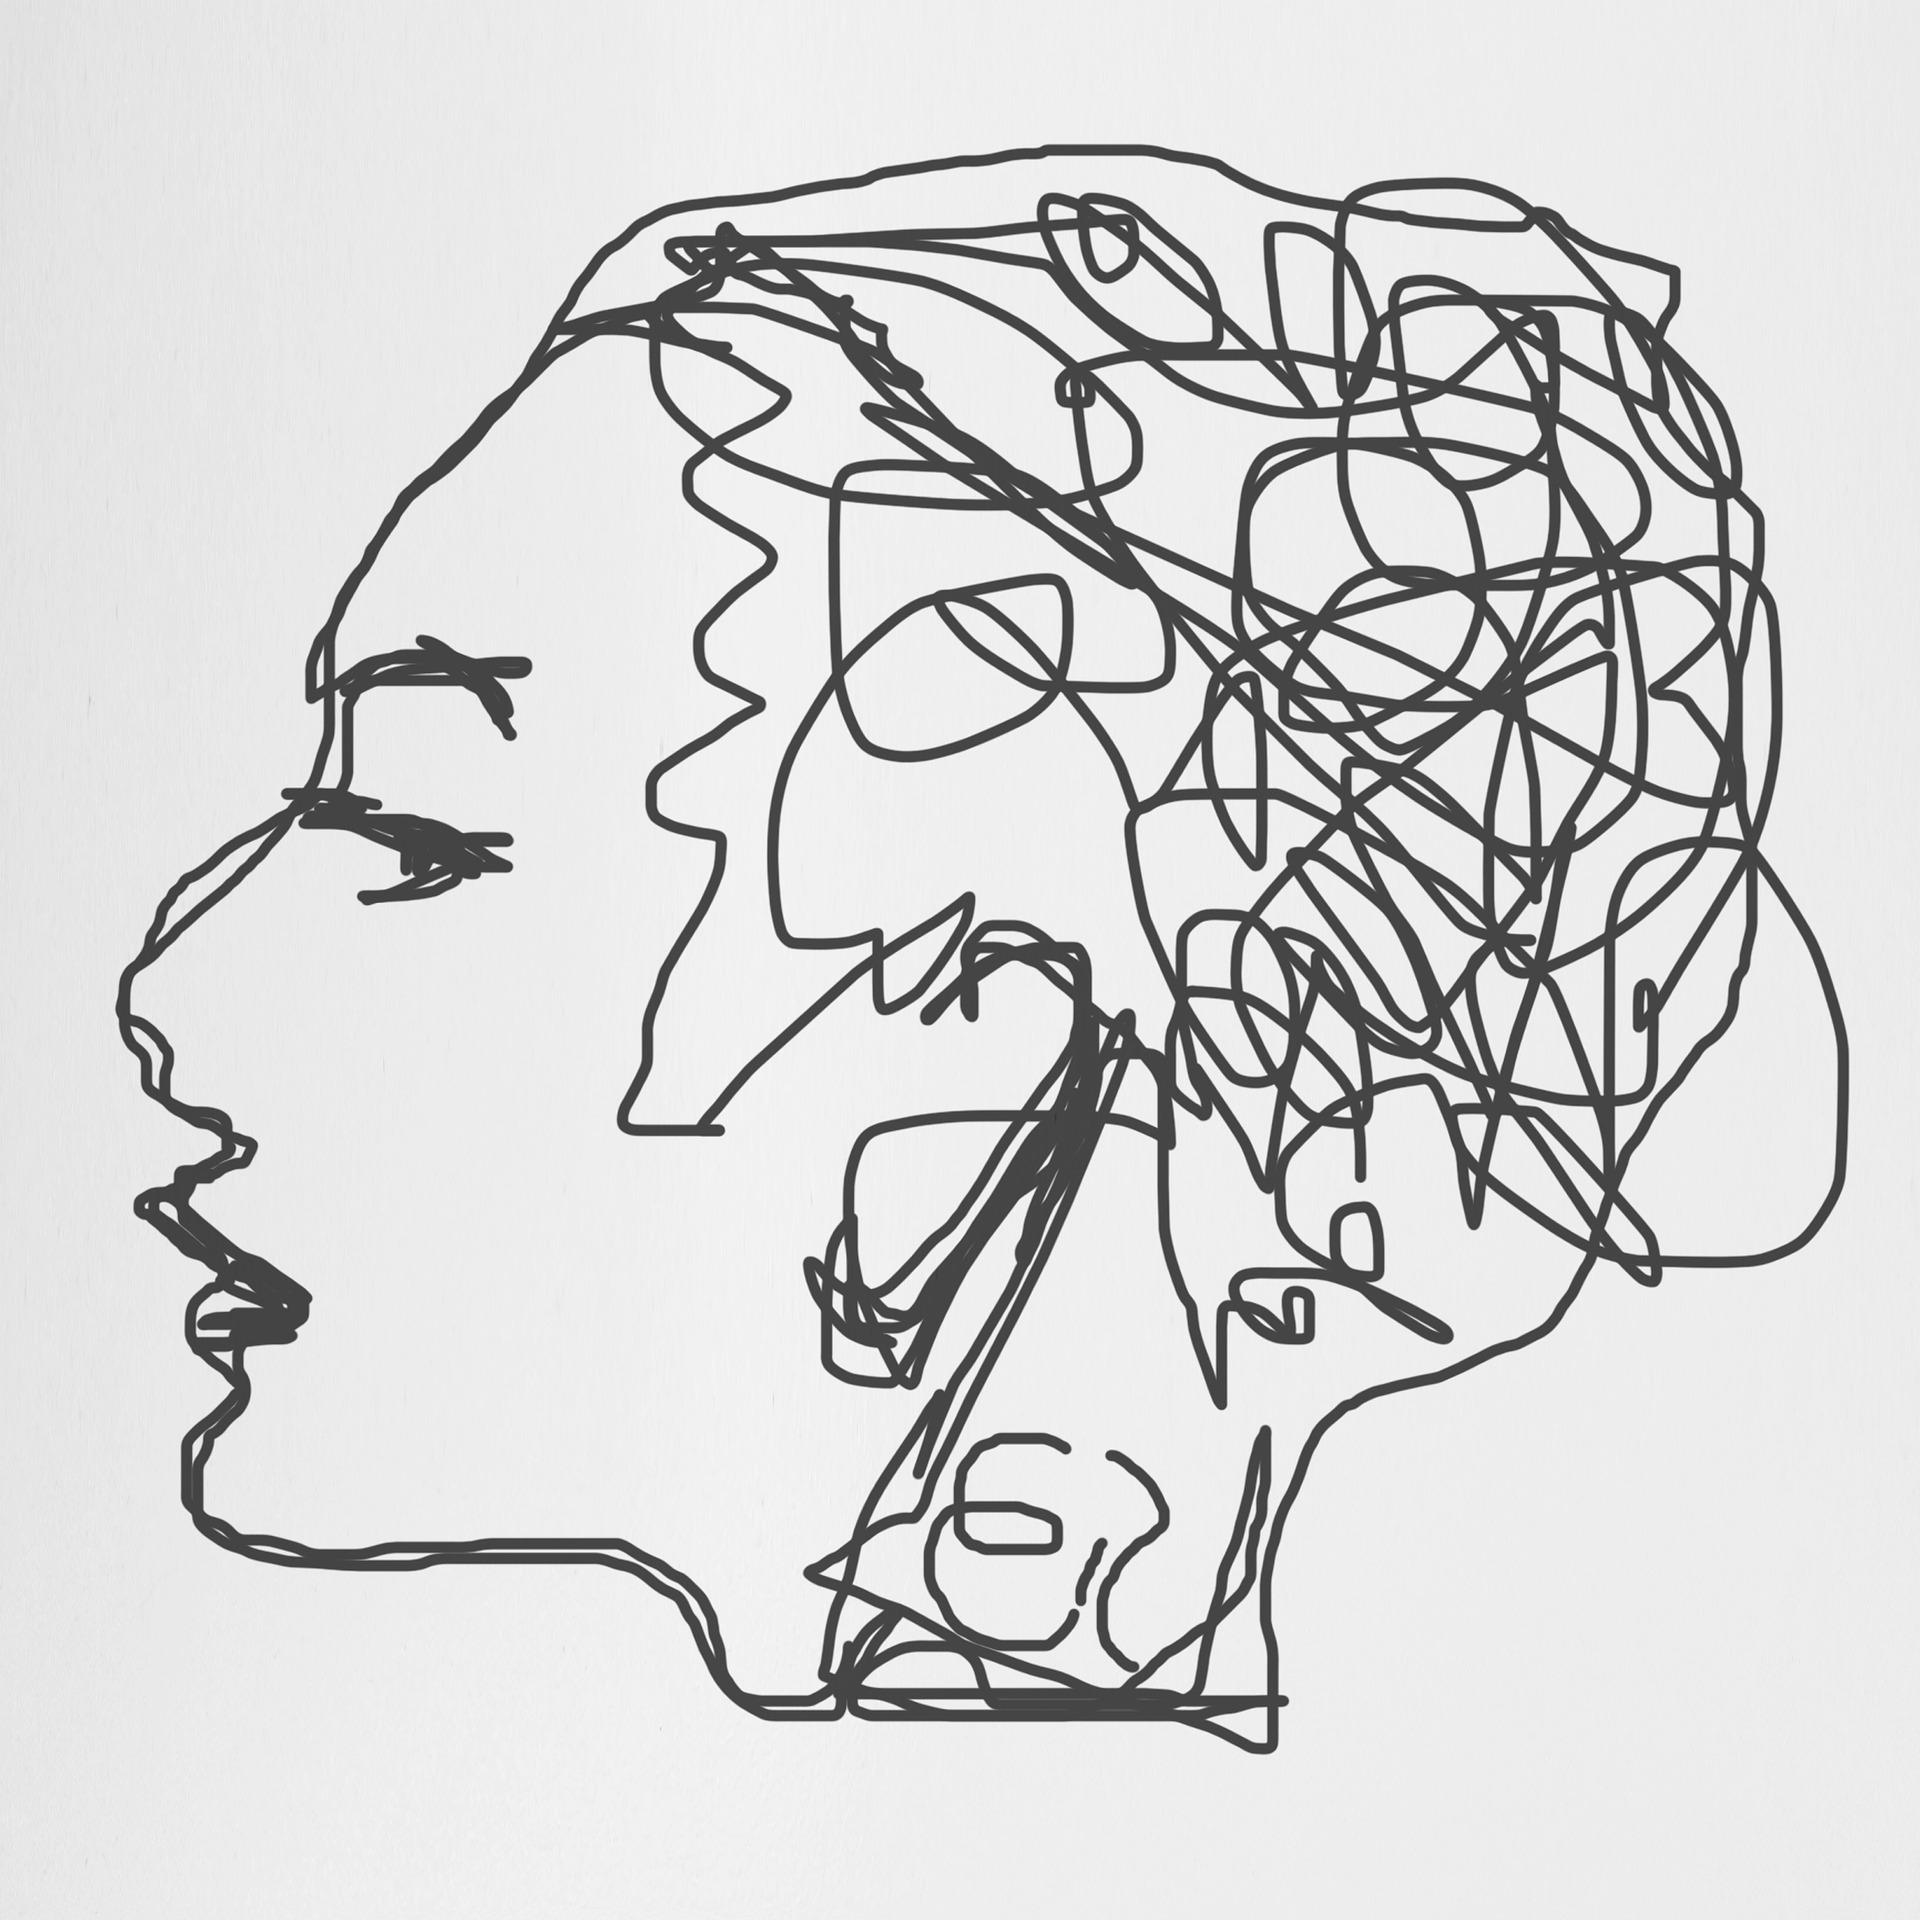 Otro reto-Sesgo cognitivo